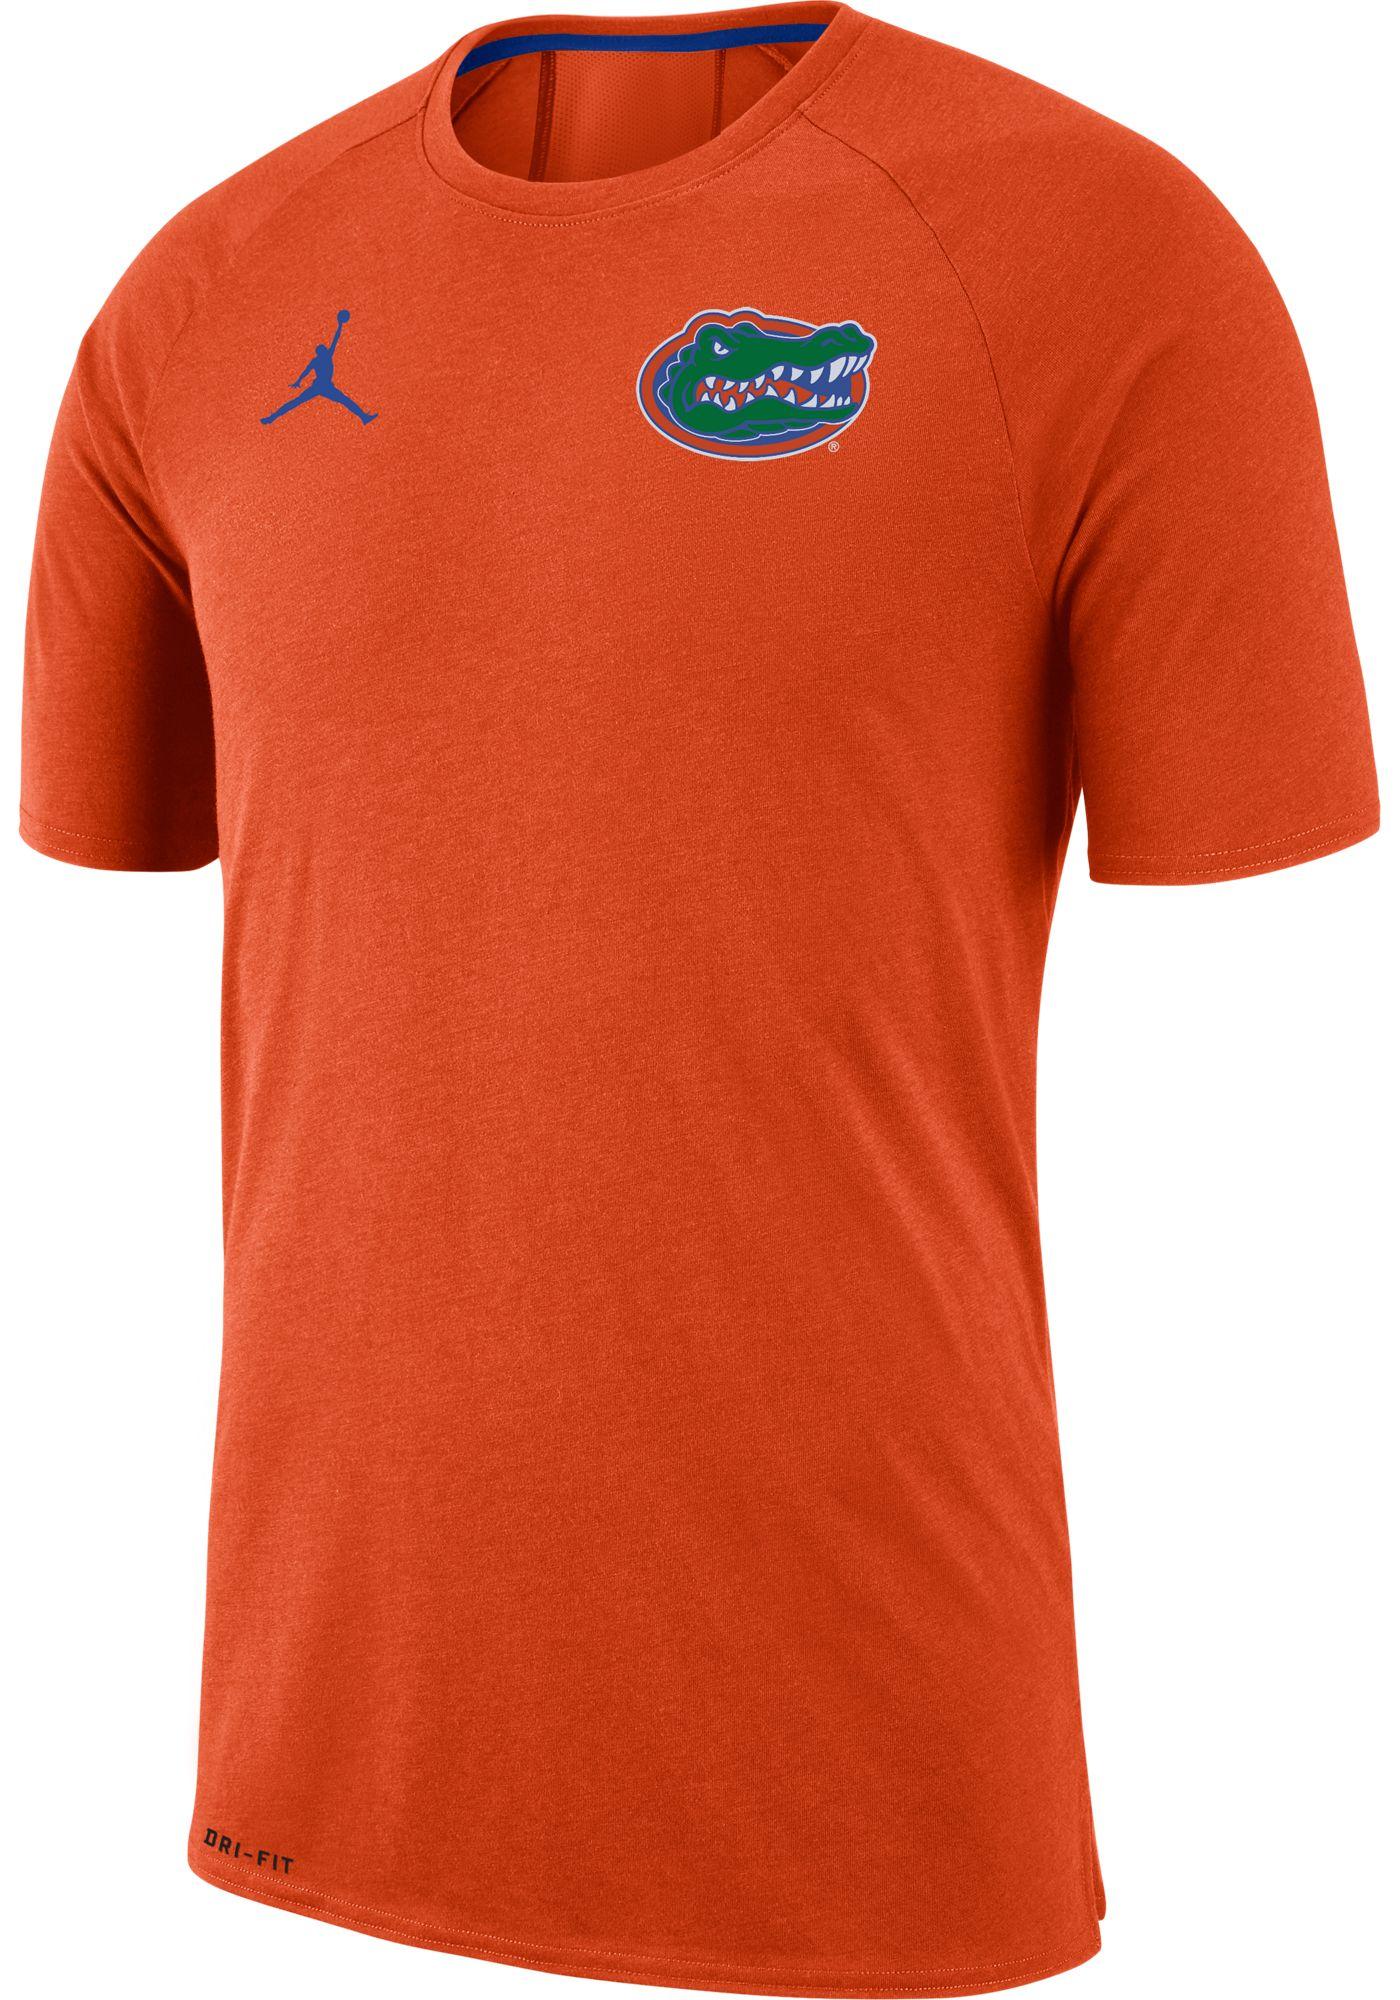 Jordan Men's Florida Gators Orange Dri-FIT 23 Alpha T-Shirt